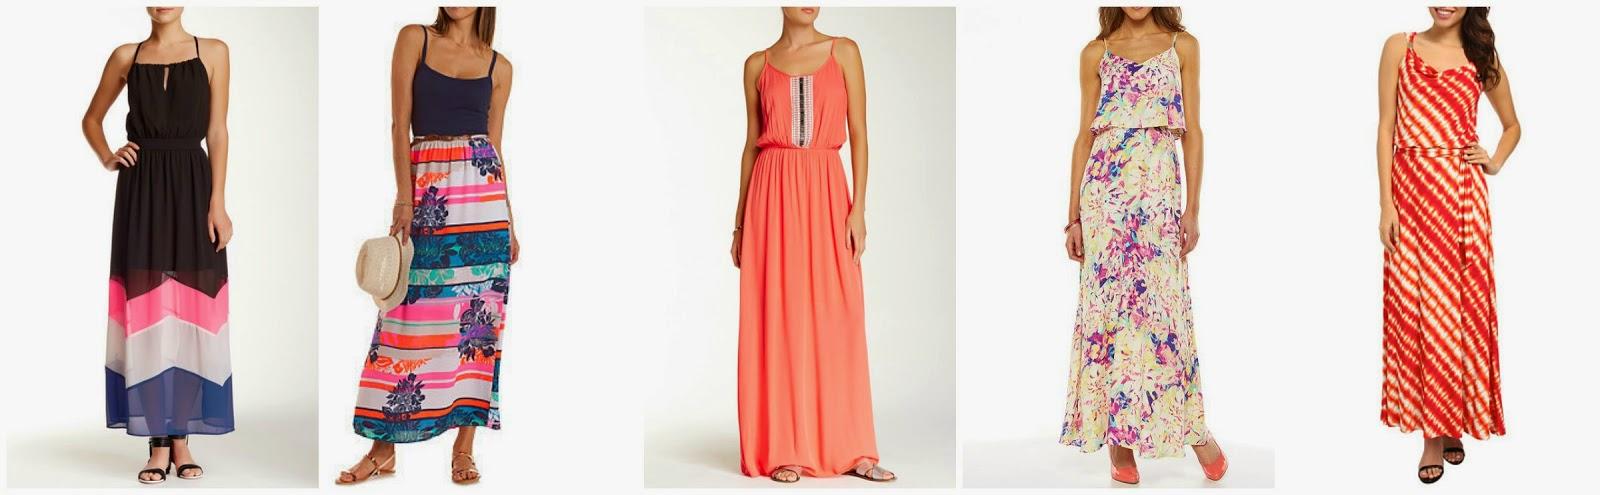 Wear It For Less: MYLEENE KLASS: FLORAL MAXI